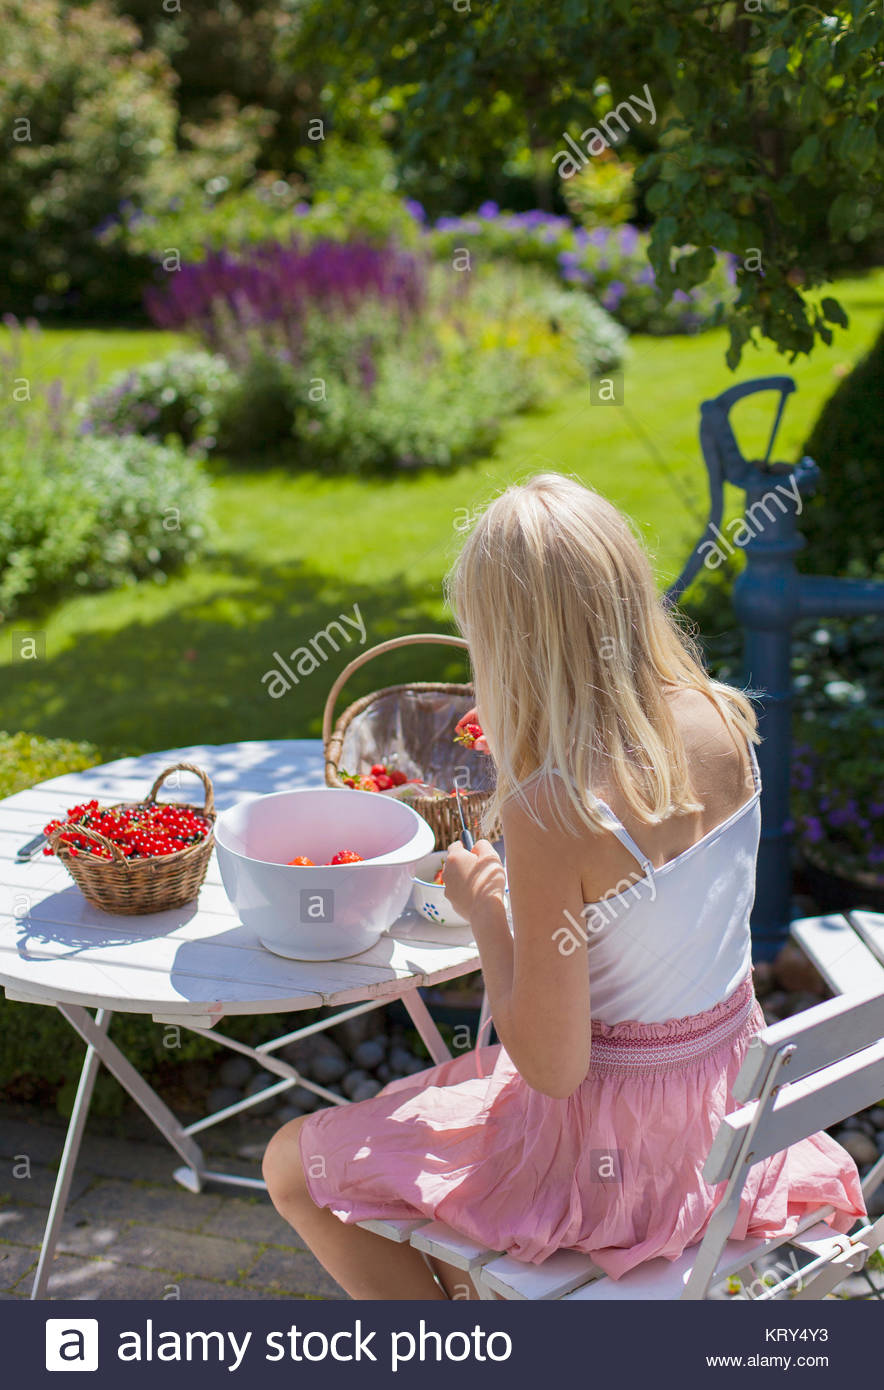 Girl cutting berries - Stock Image